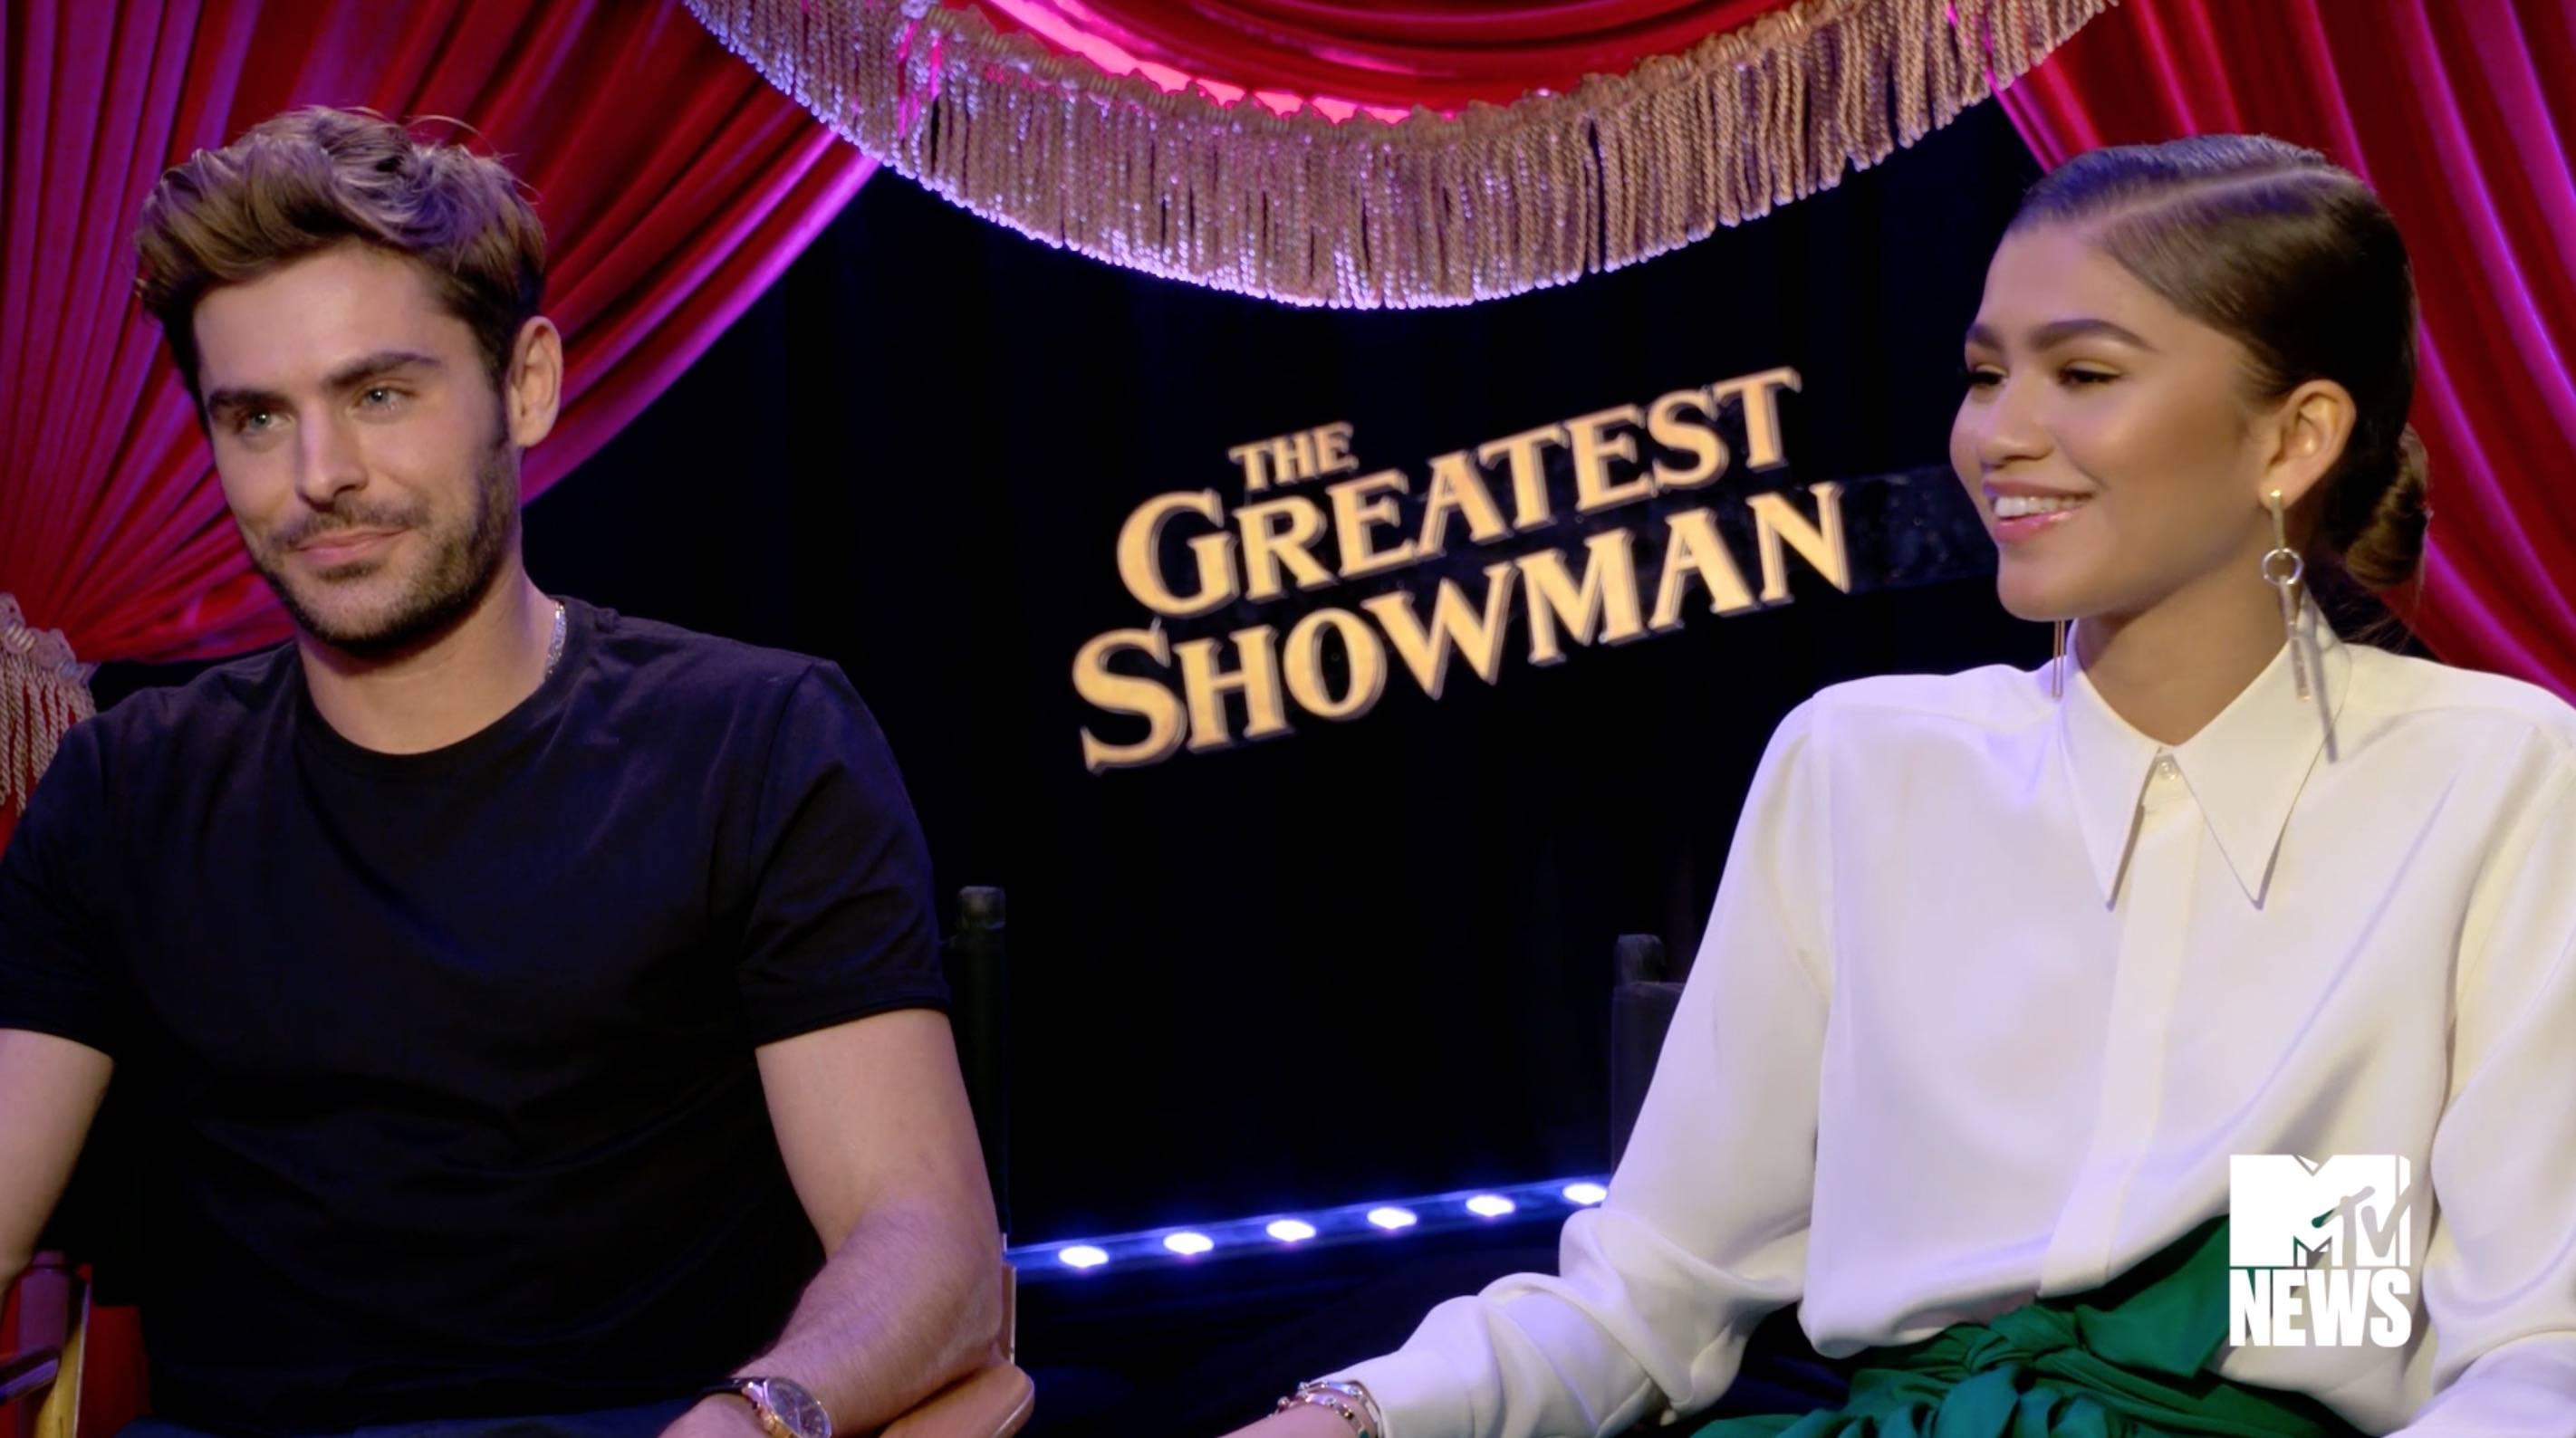 The Great Showman: Zendaya and Zac Efron's Magic